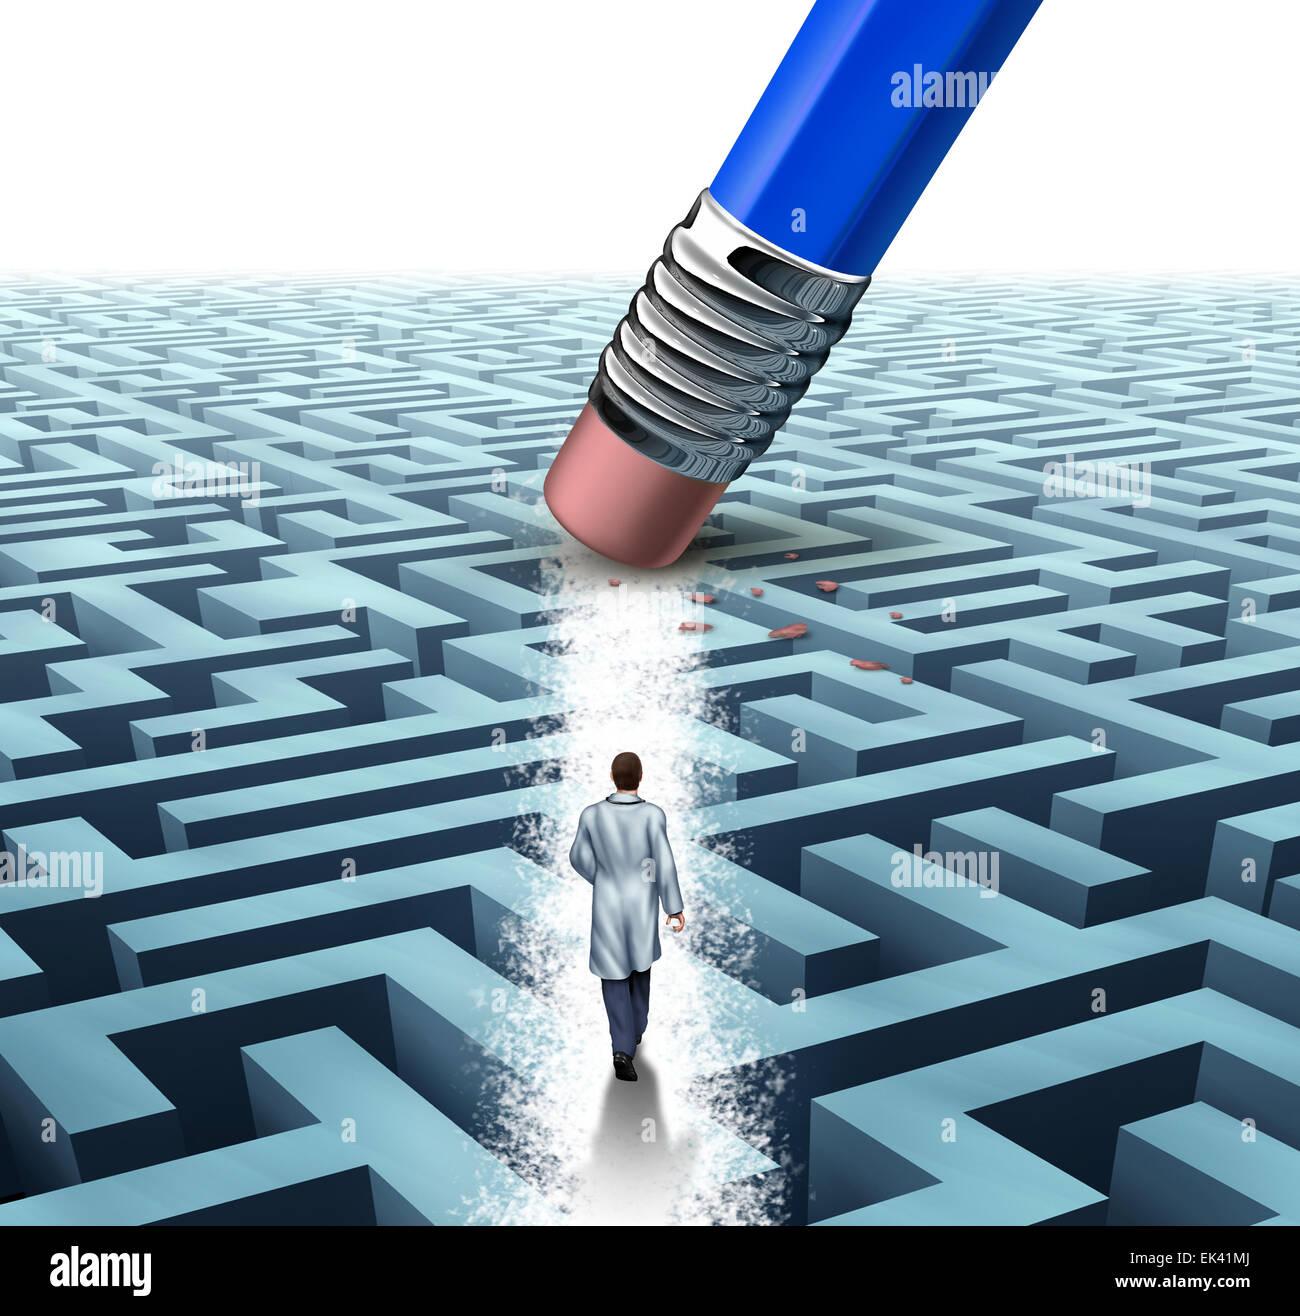 Concepto de cuidados médicos de salud de liderazgo como médico o científico caminando a través Imagen De Stock